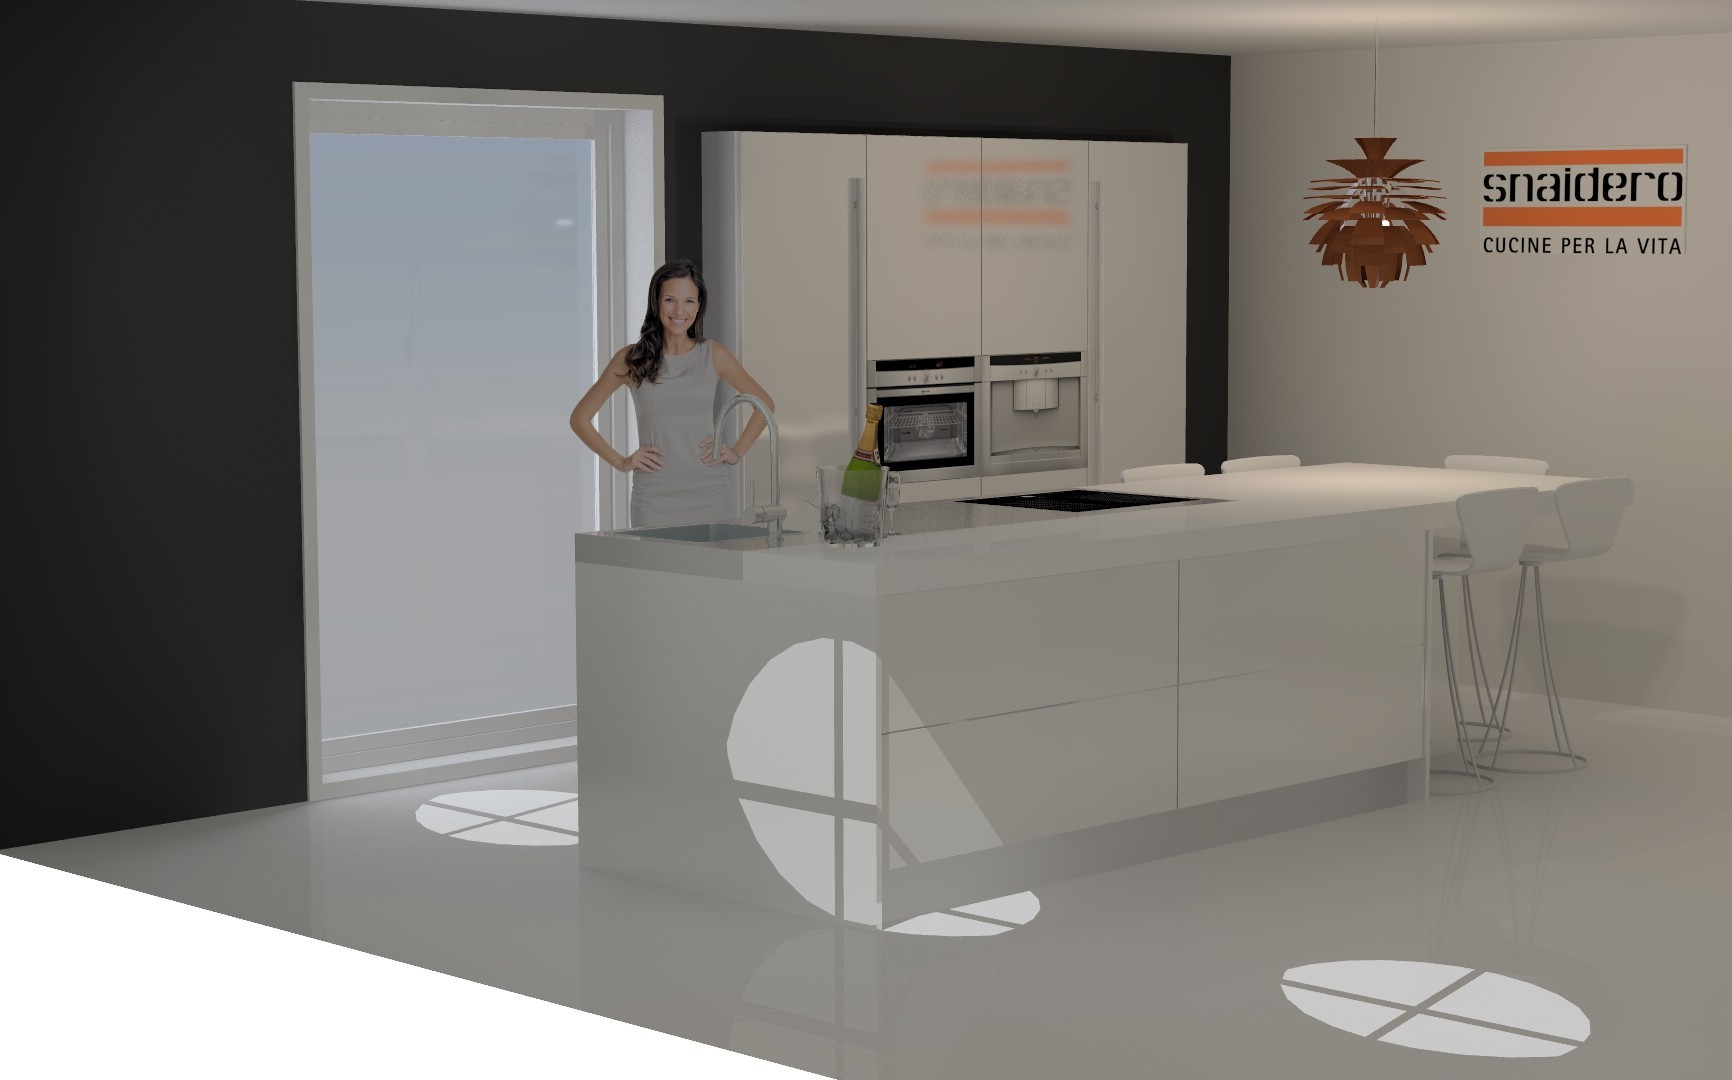 Snaidero Concept Store - stijlvolle designkeukens, Italiaans ...